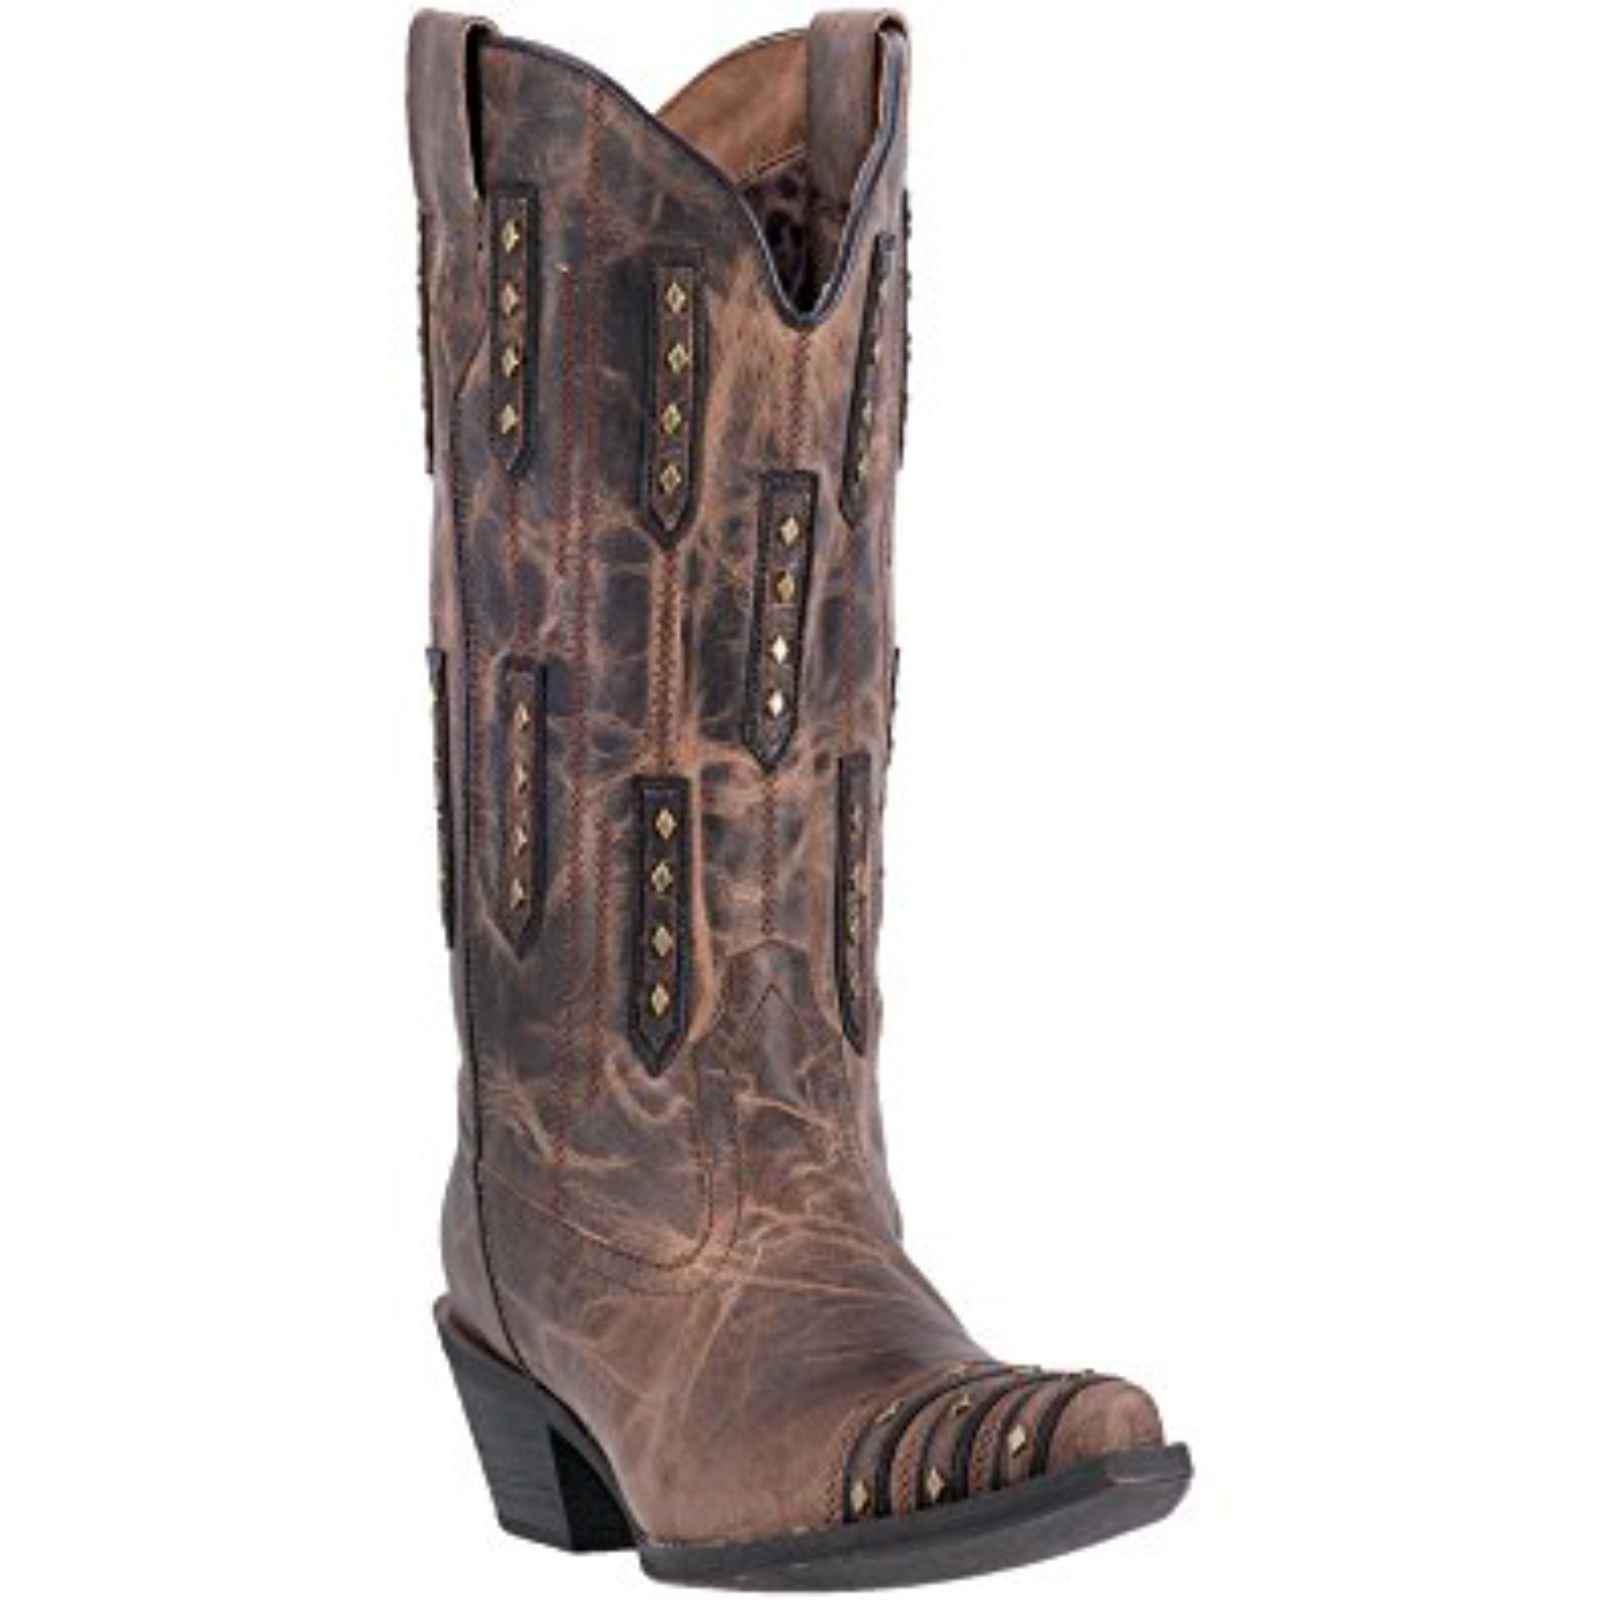 "Laredo Women's 12"" Leather Whiskey Sour Bone Boot Brown, 52124 by DAN POST"